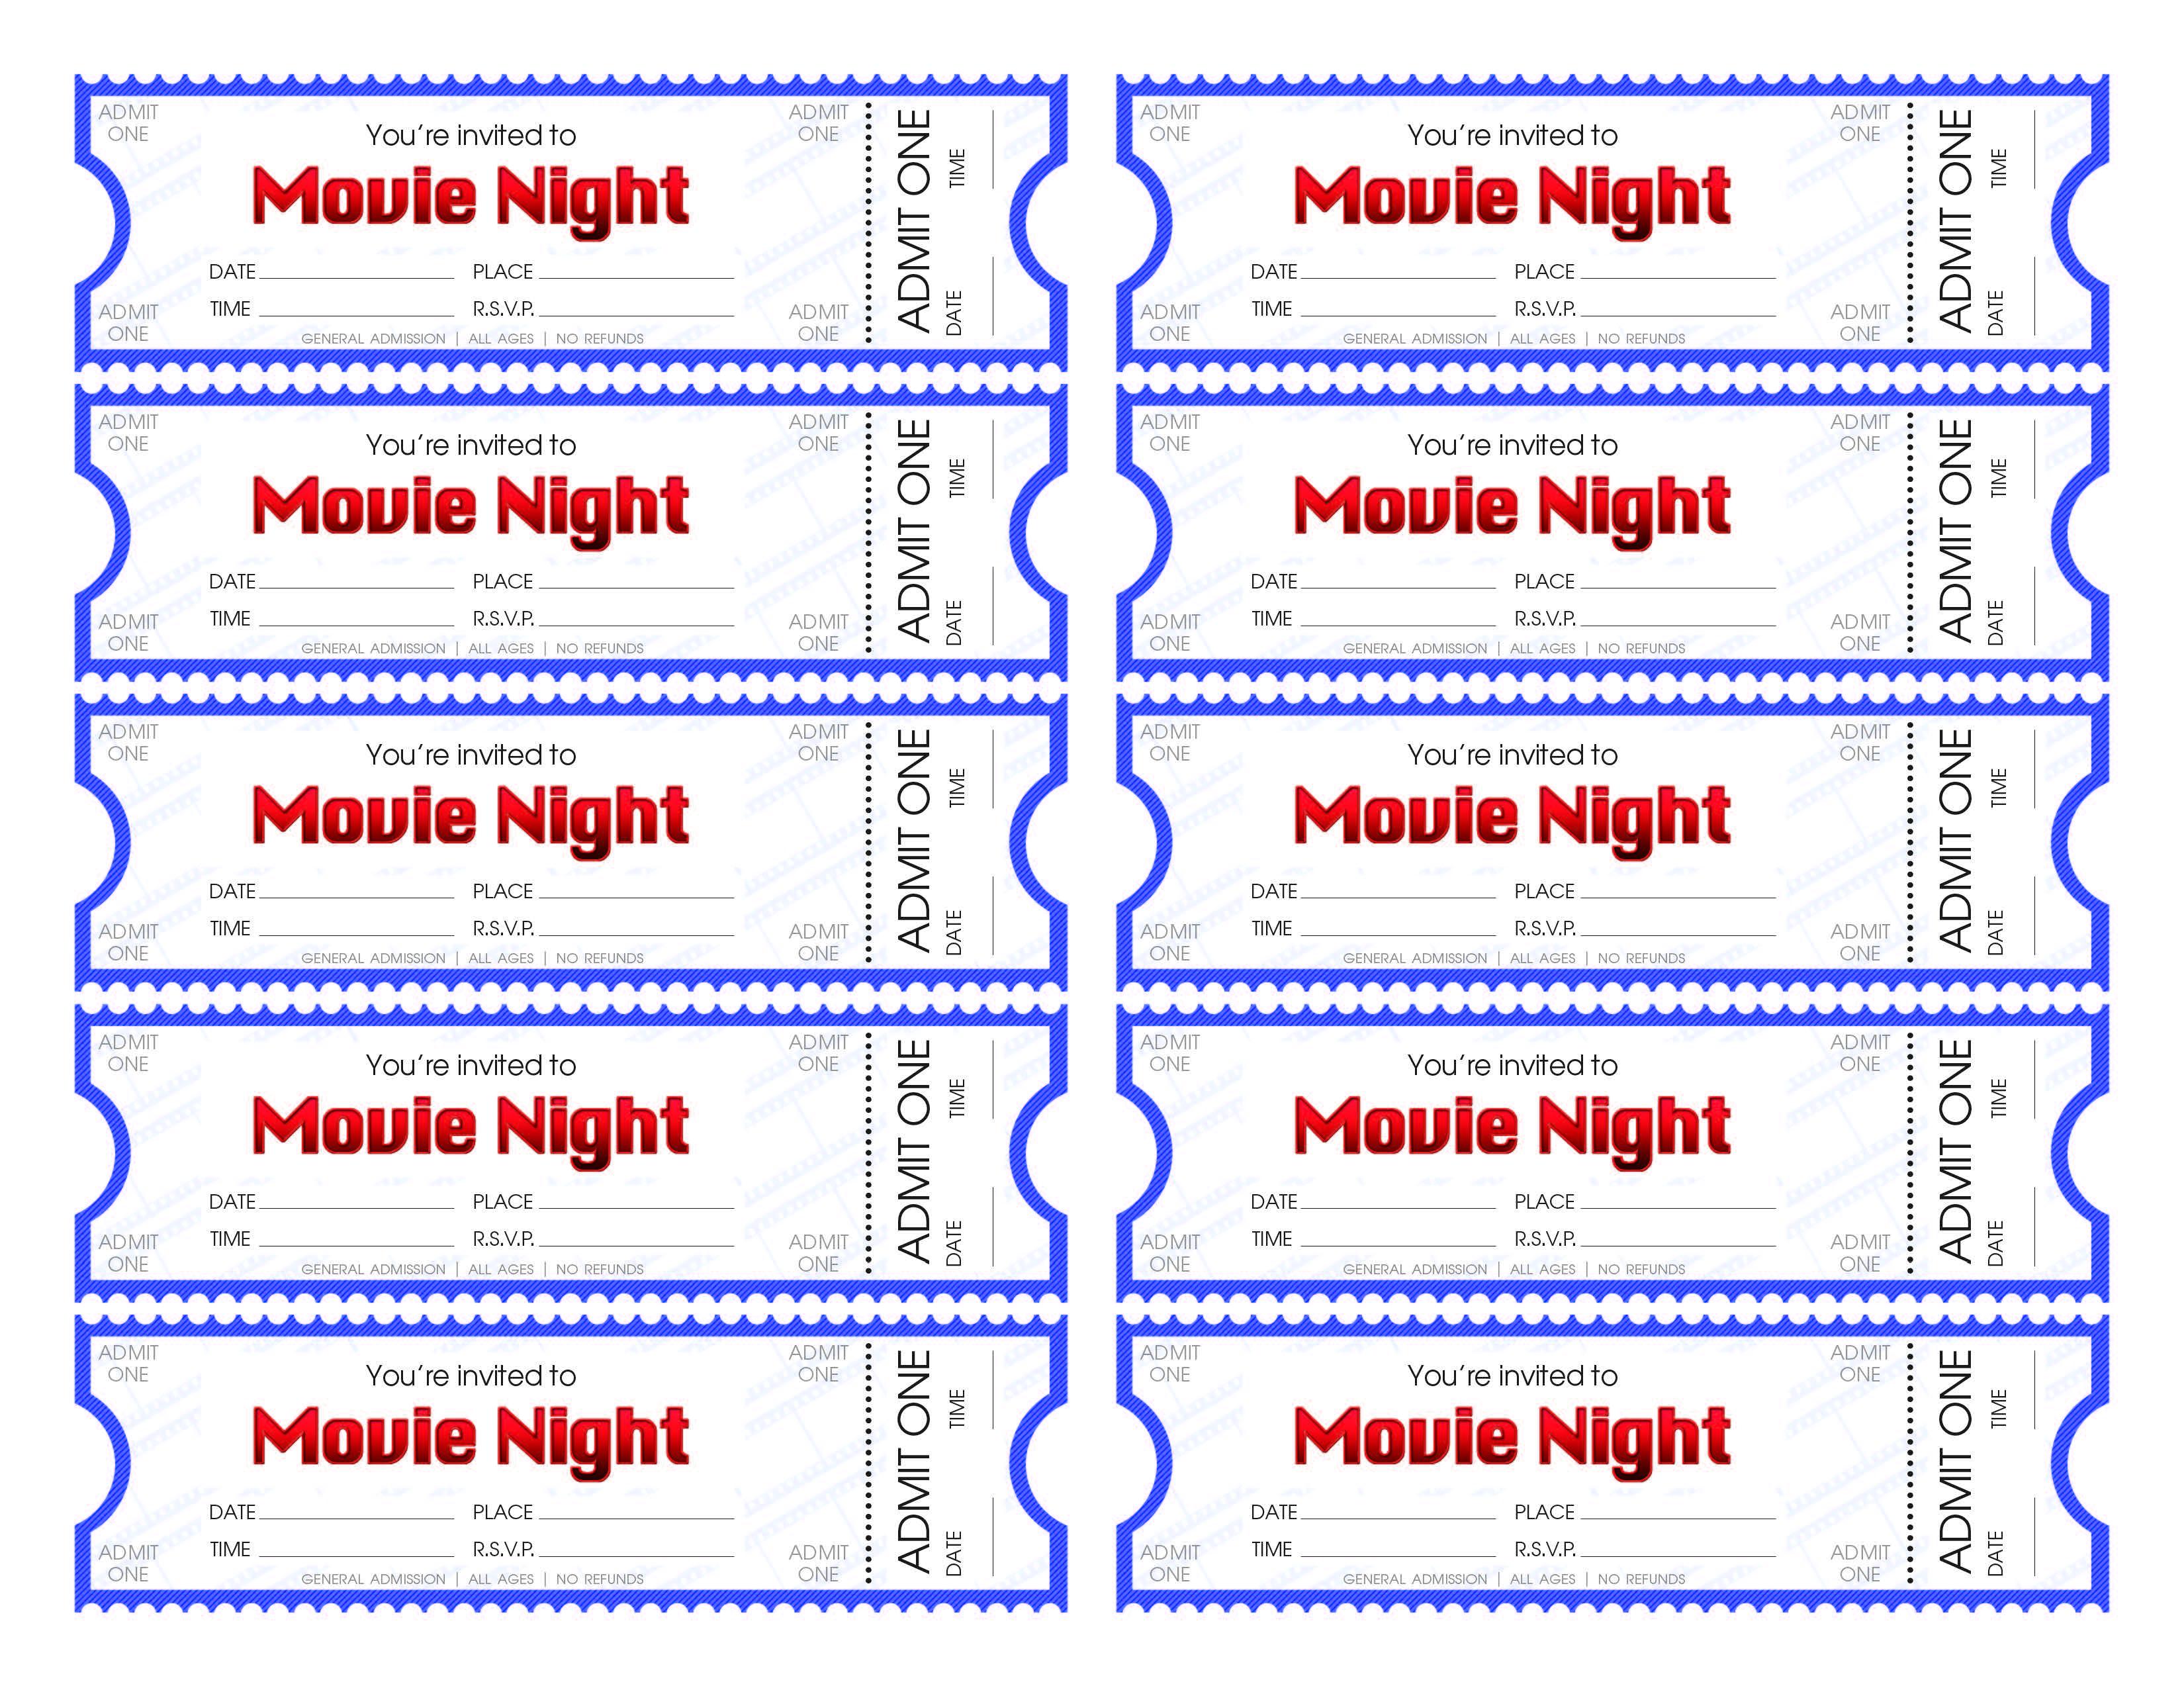 Free Printable Movie Ticket Templates